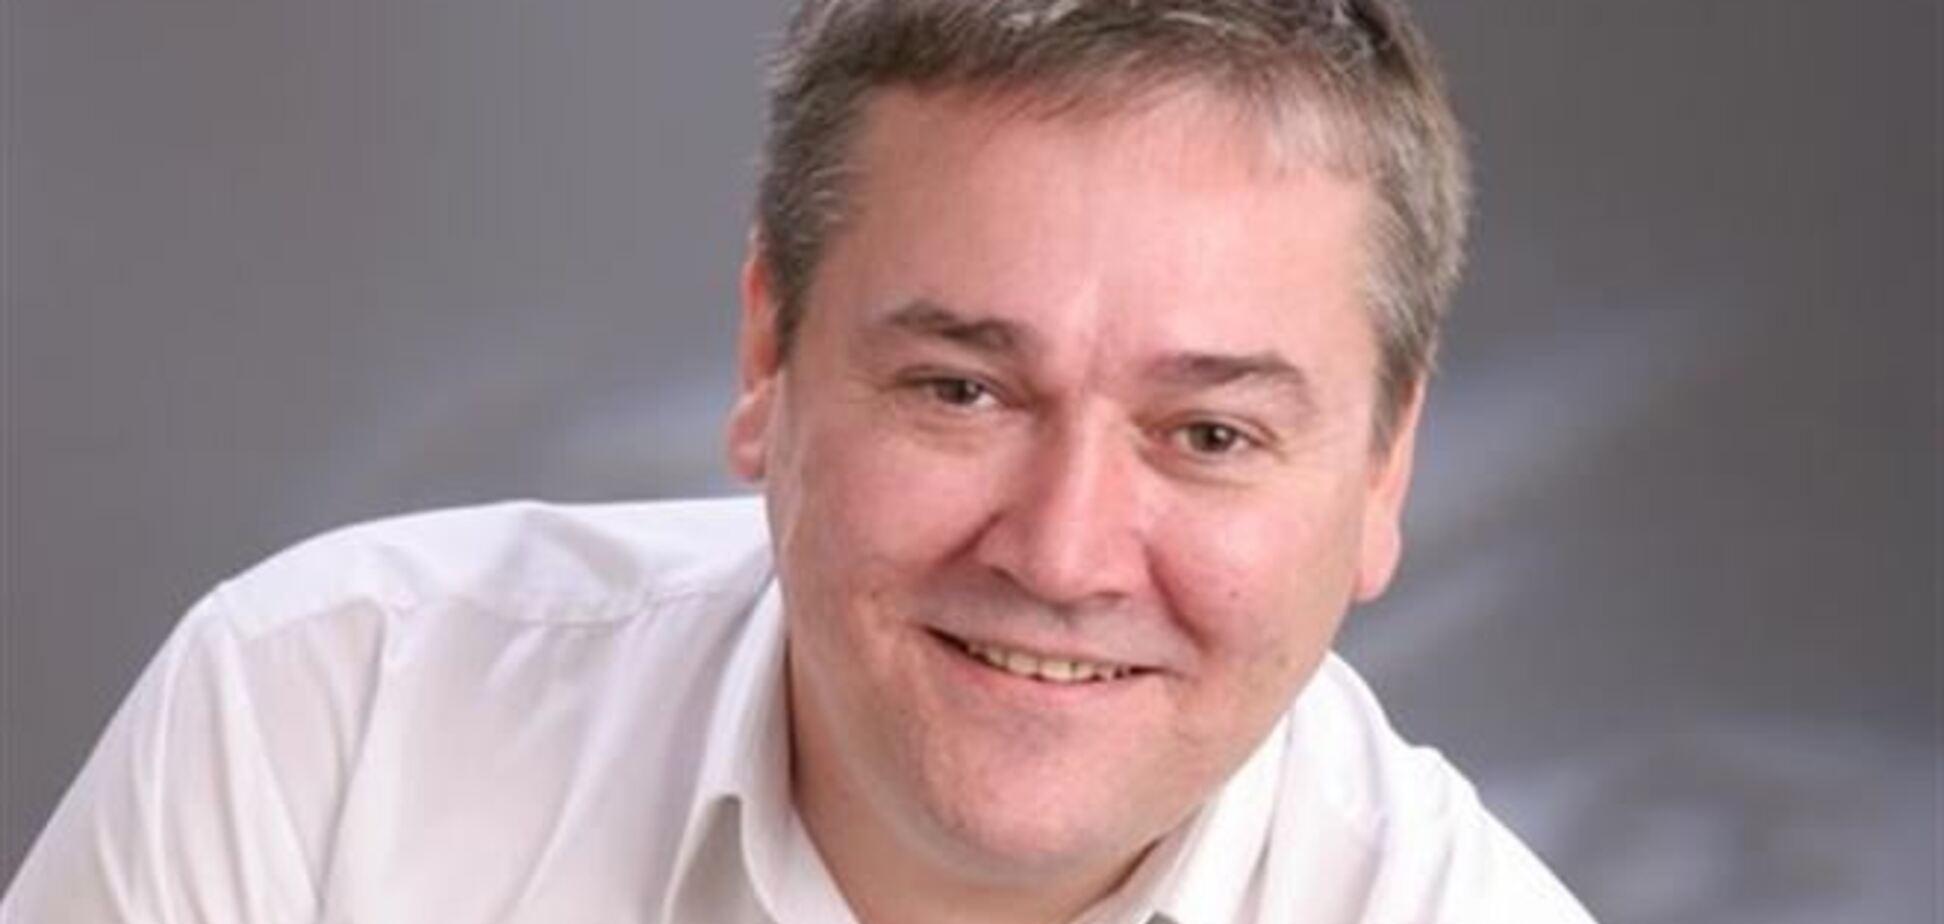 Депутат-регионал сдал мандат и едет на Евромайдан